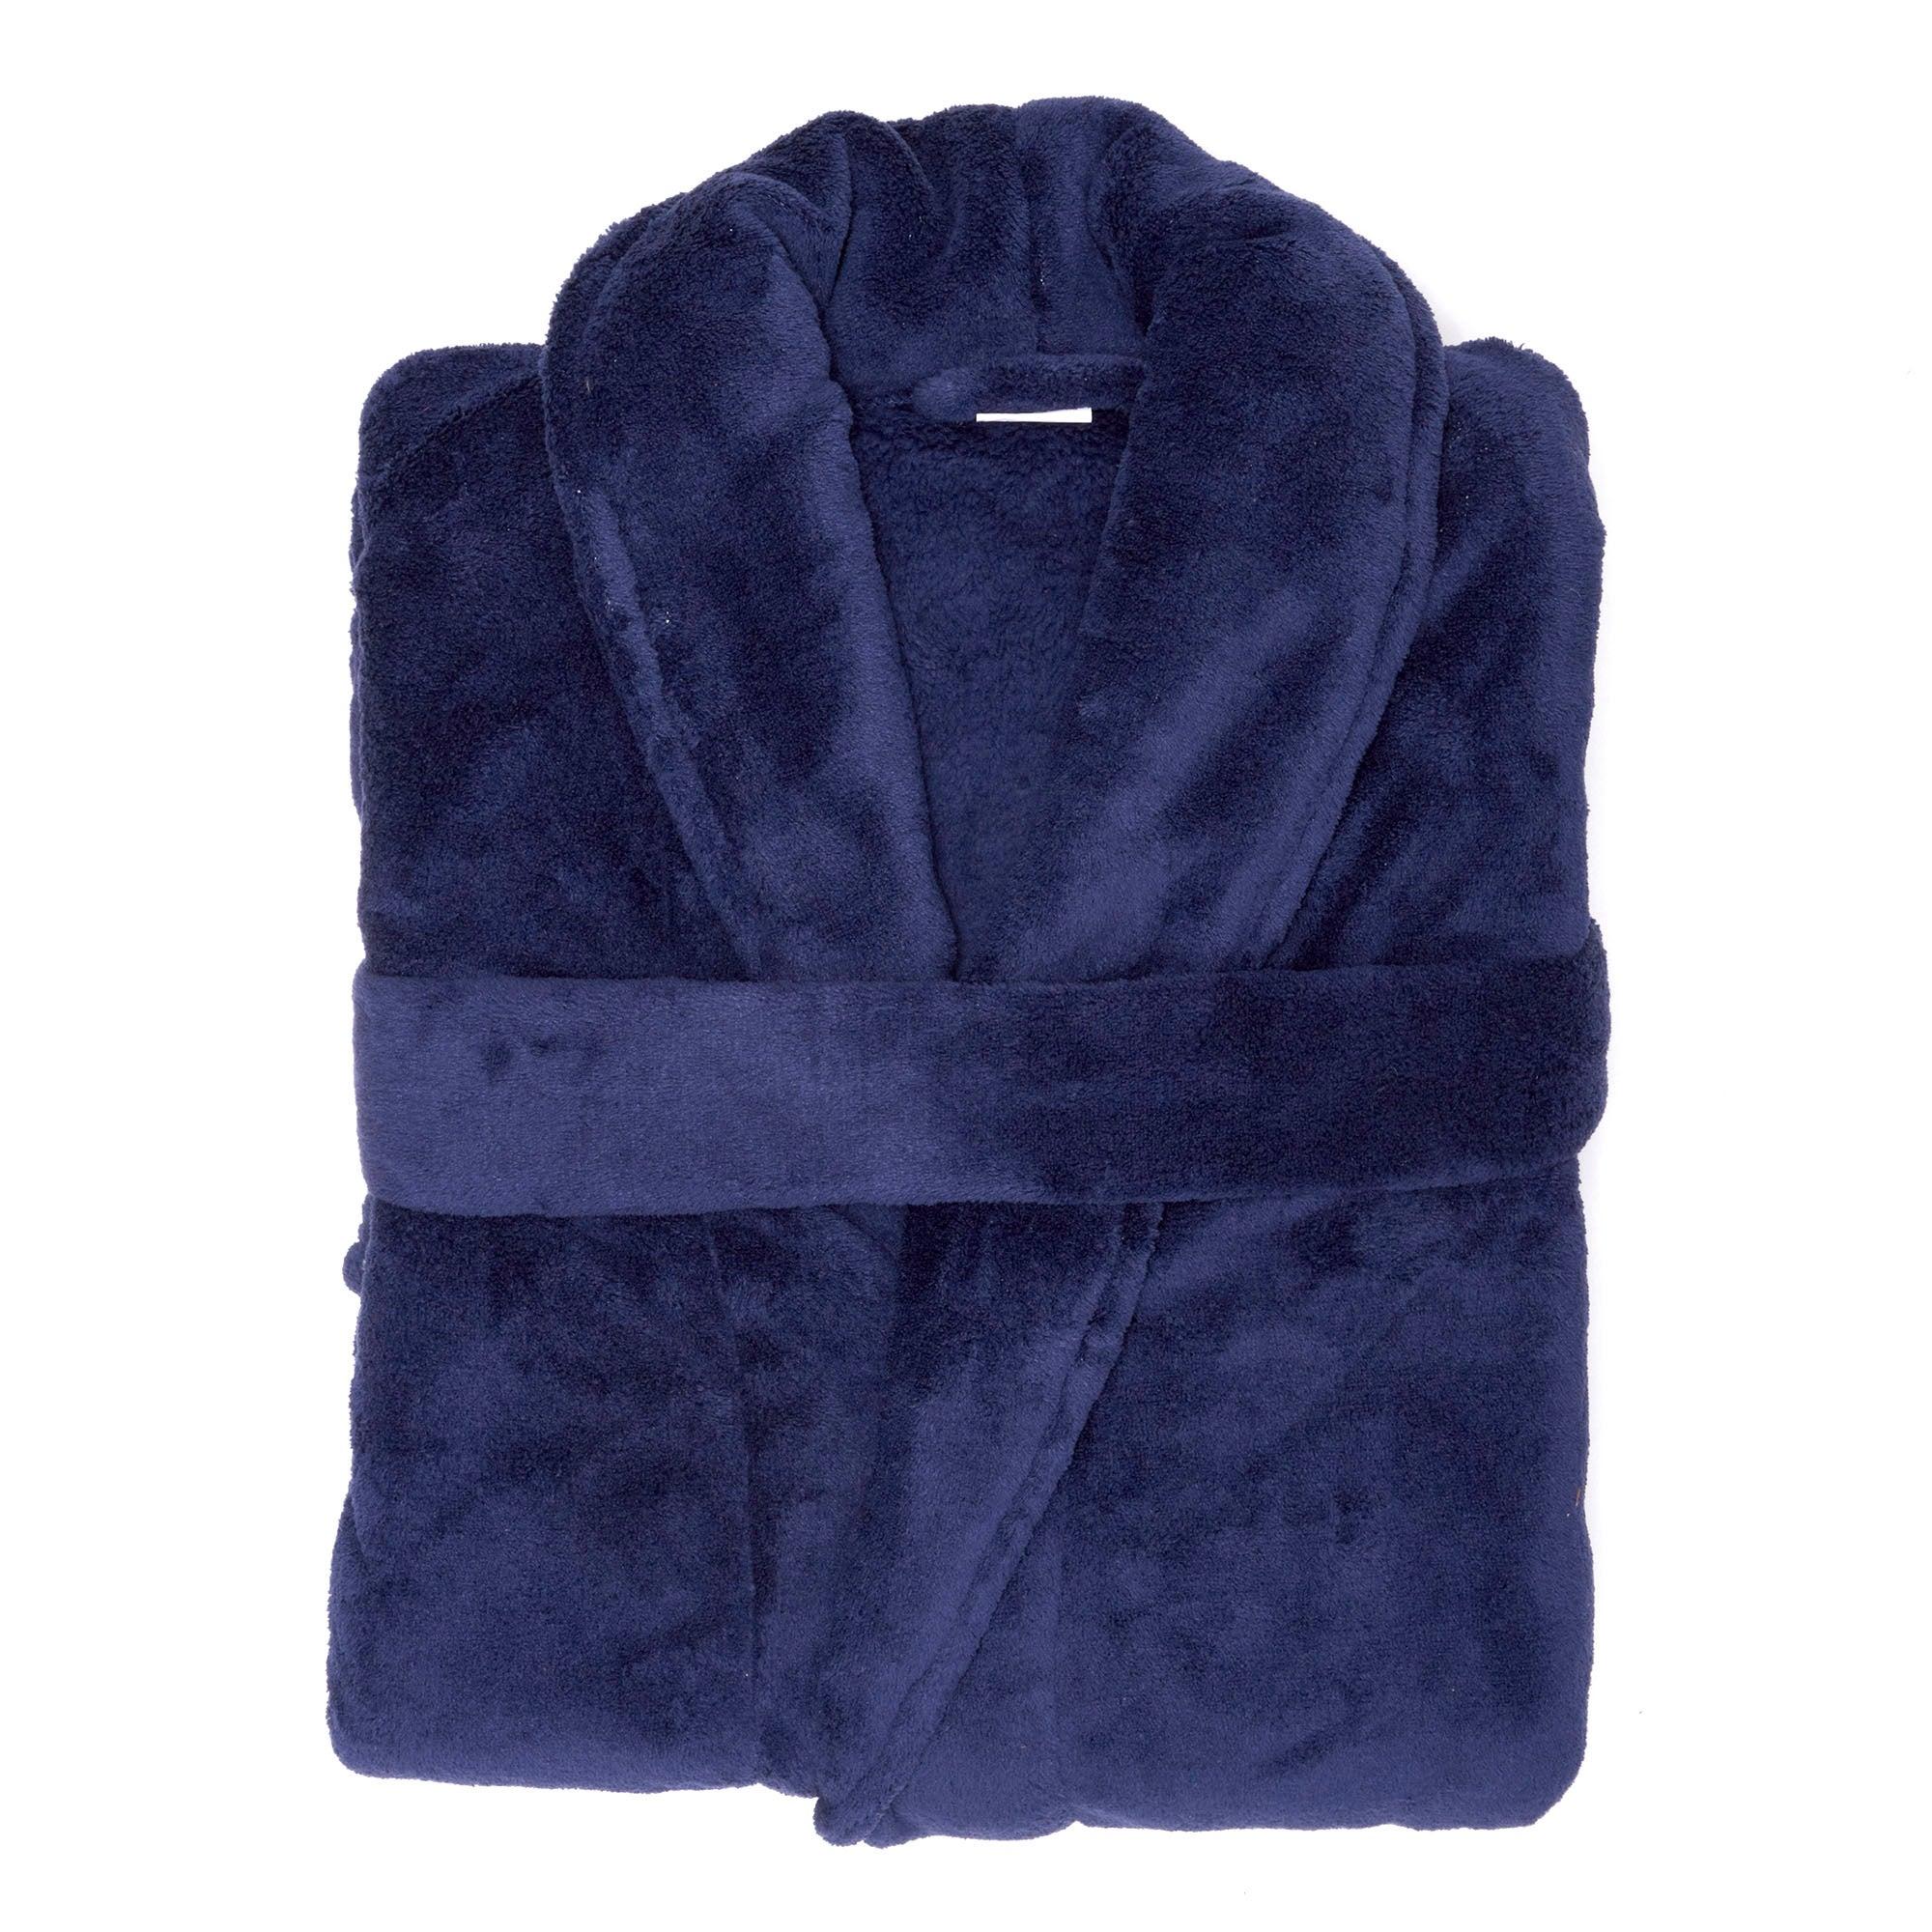 Mens Super Soft Bath Robe